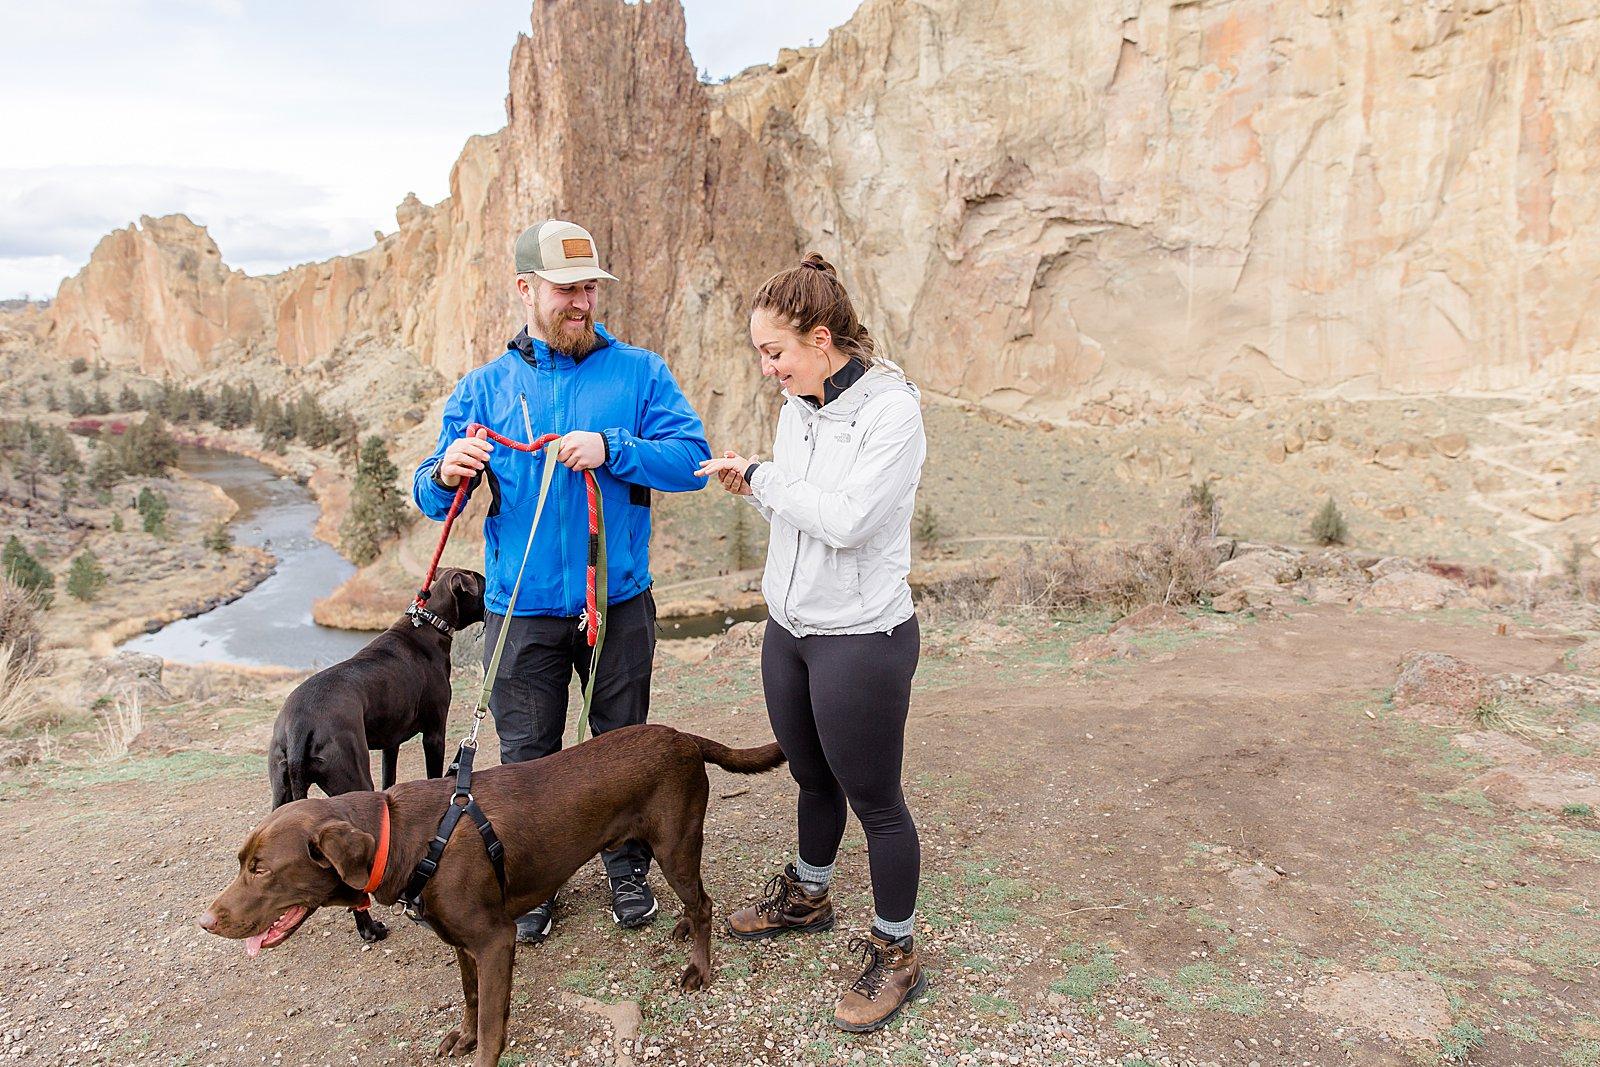 Smith Rock State Park Surprise Proposal